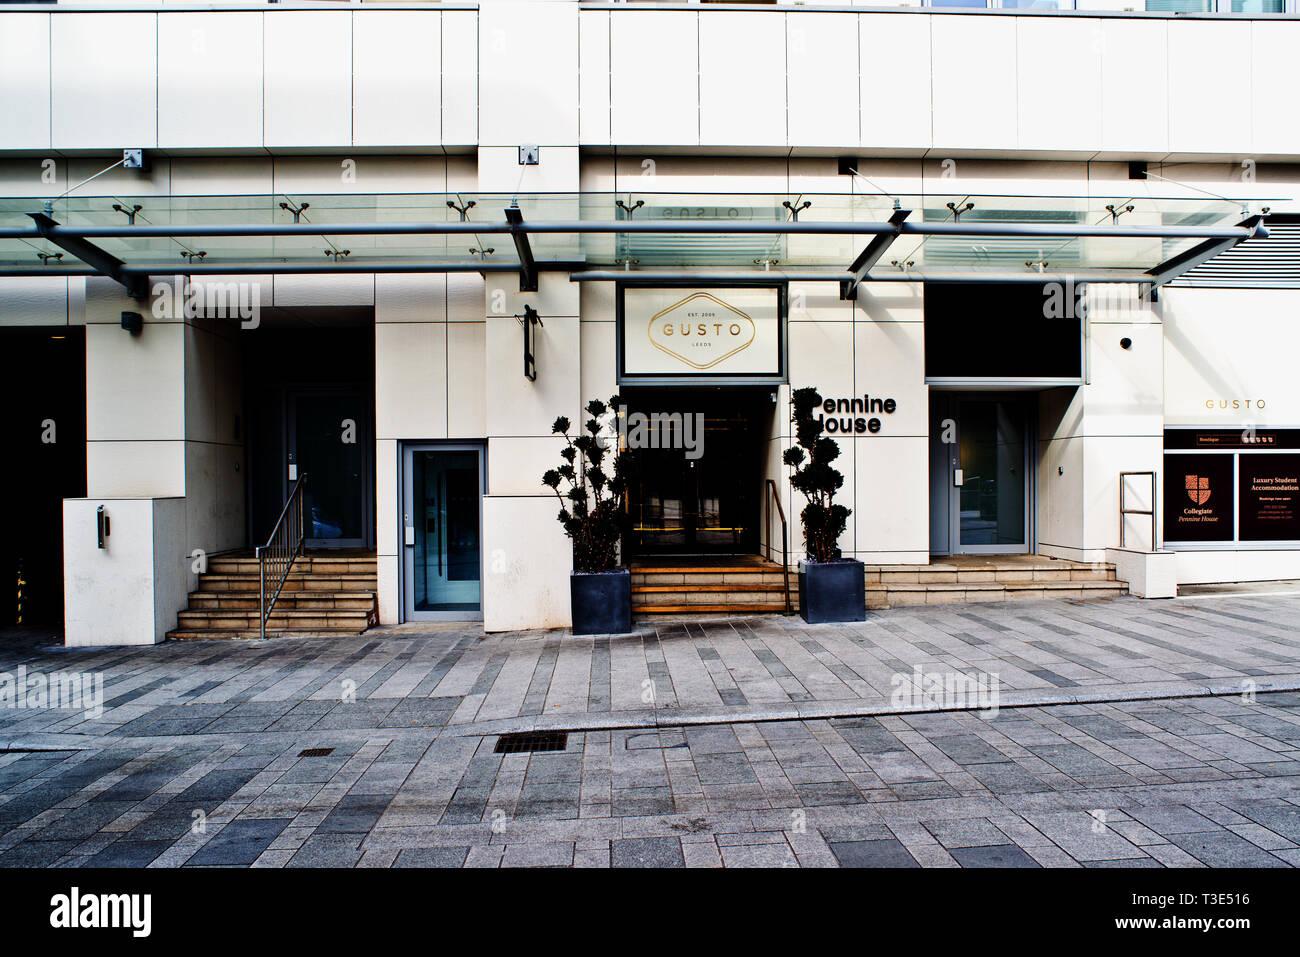 Gusto Ristorante Italiano, Pennine House, Leeds, Inghilterra Immagini Stock